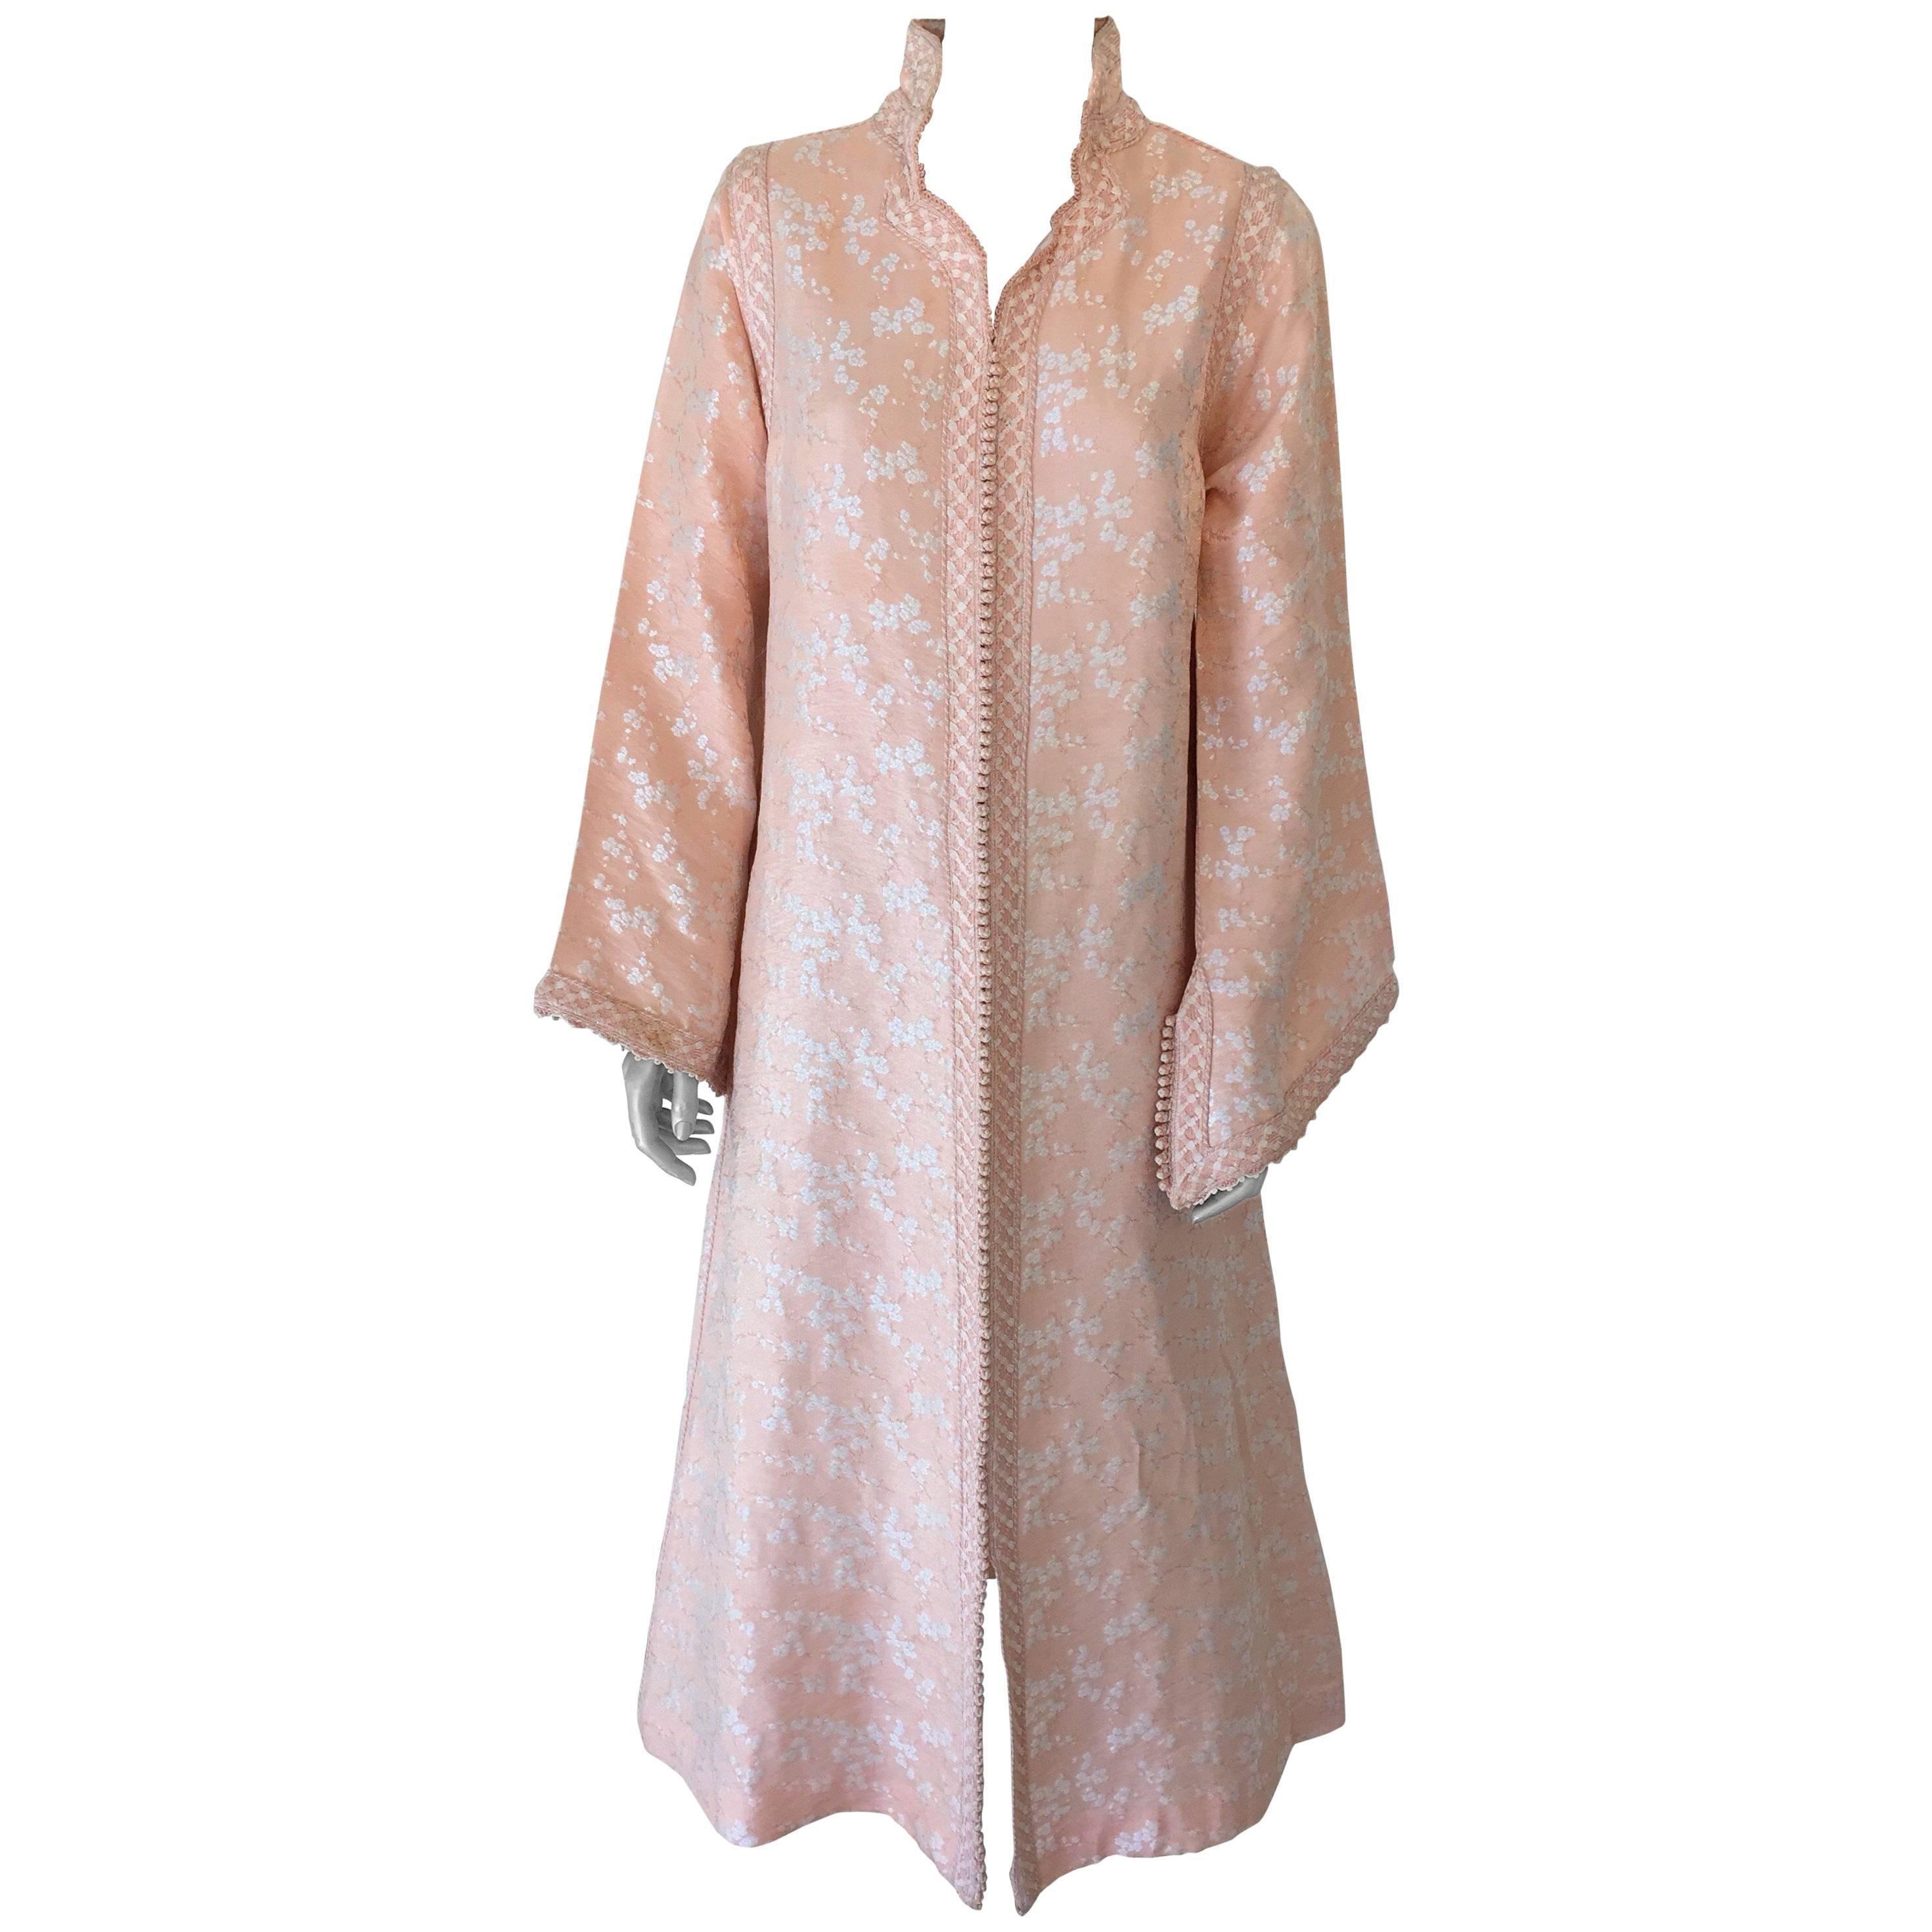 Moroccan Caftan Maxi Dress Kaftan Handmade in Morocco Africa